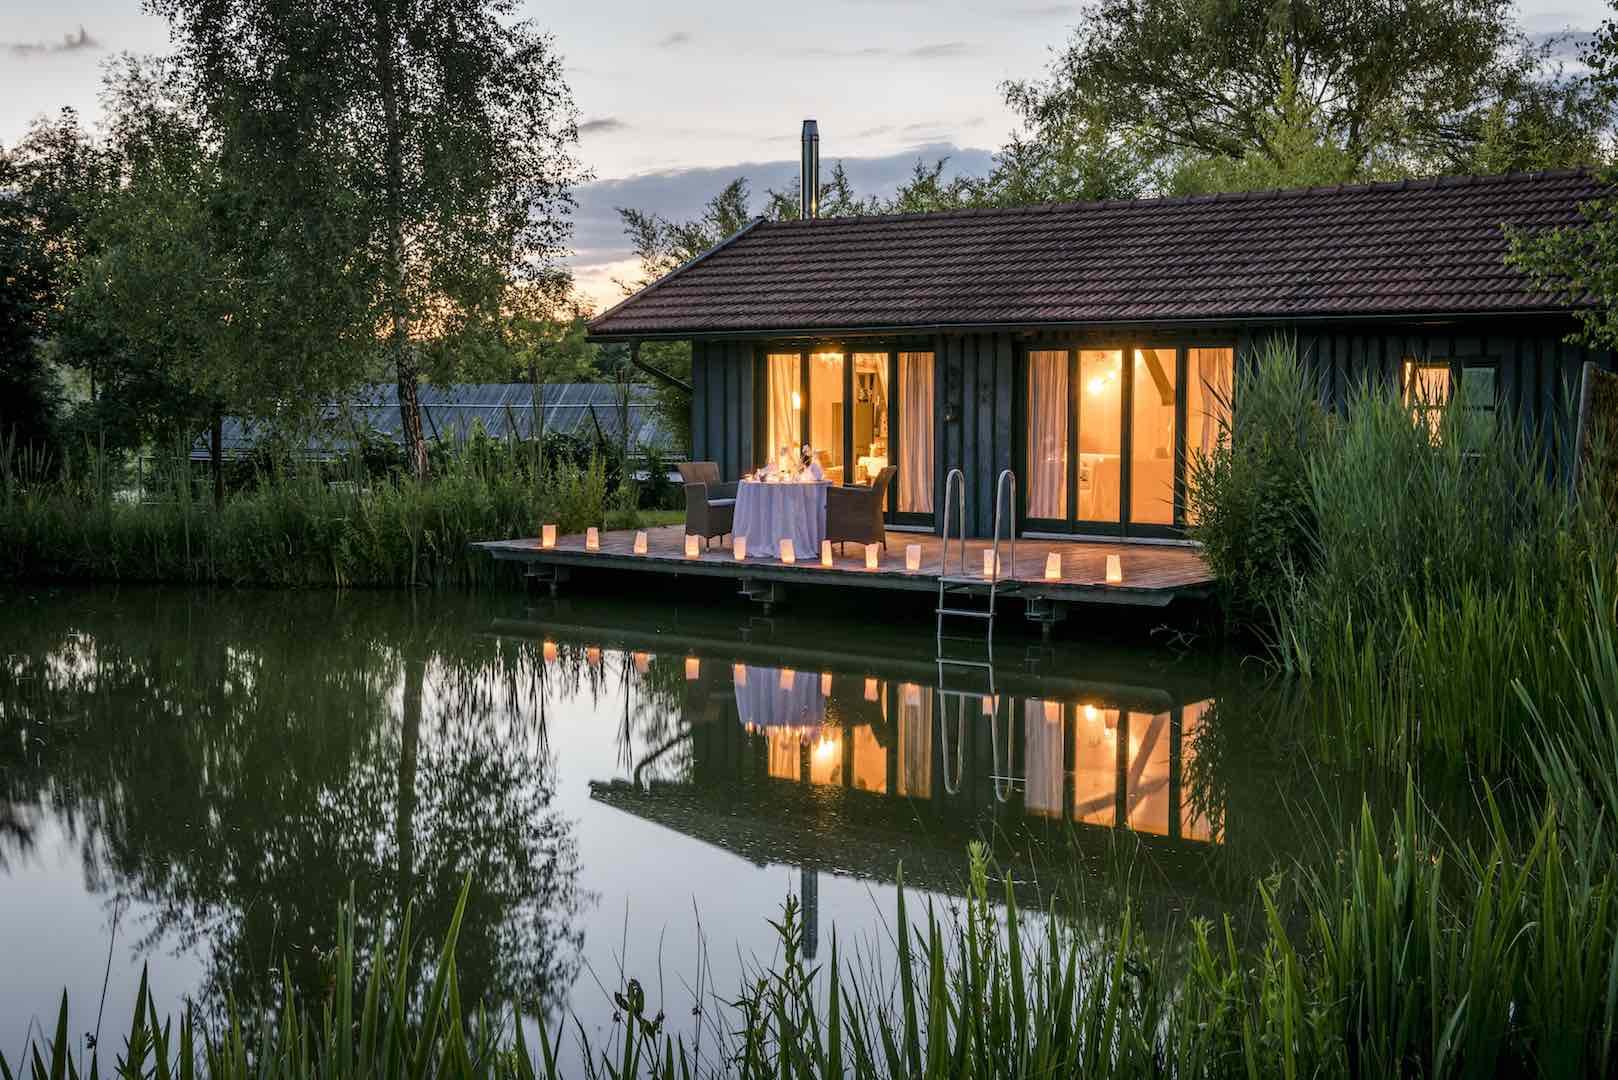 Haus am See bei Nacht Wainando Travel